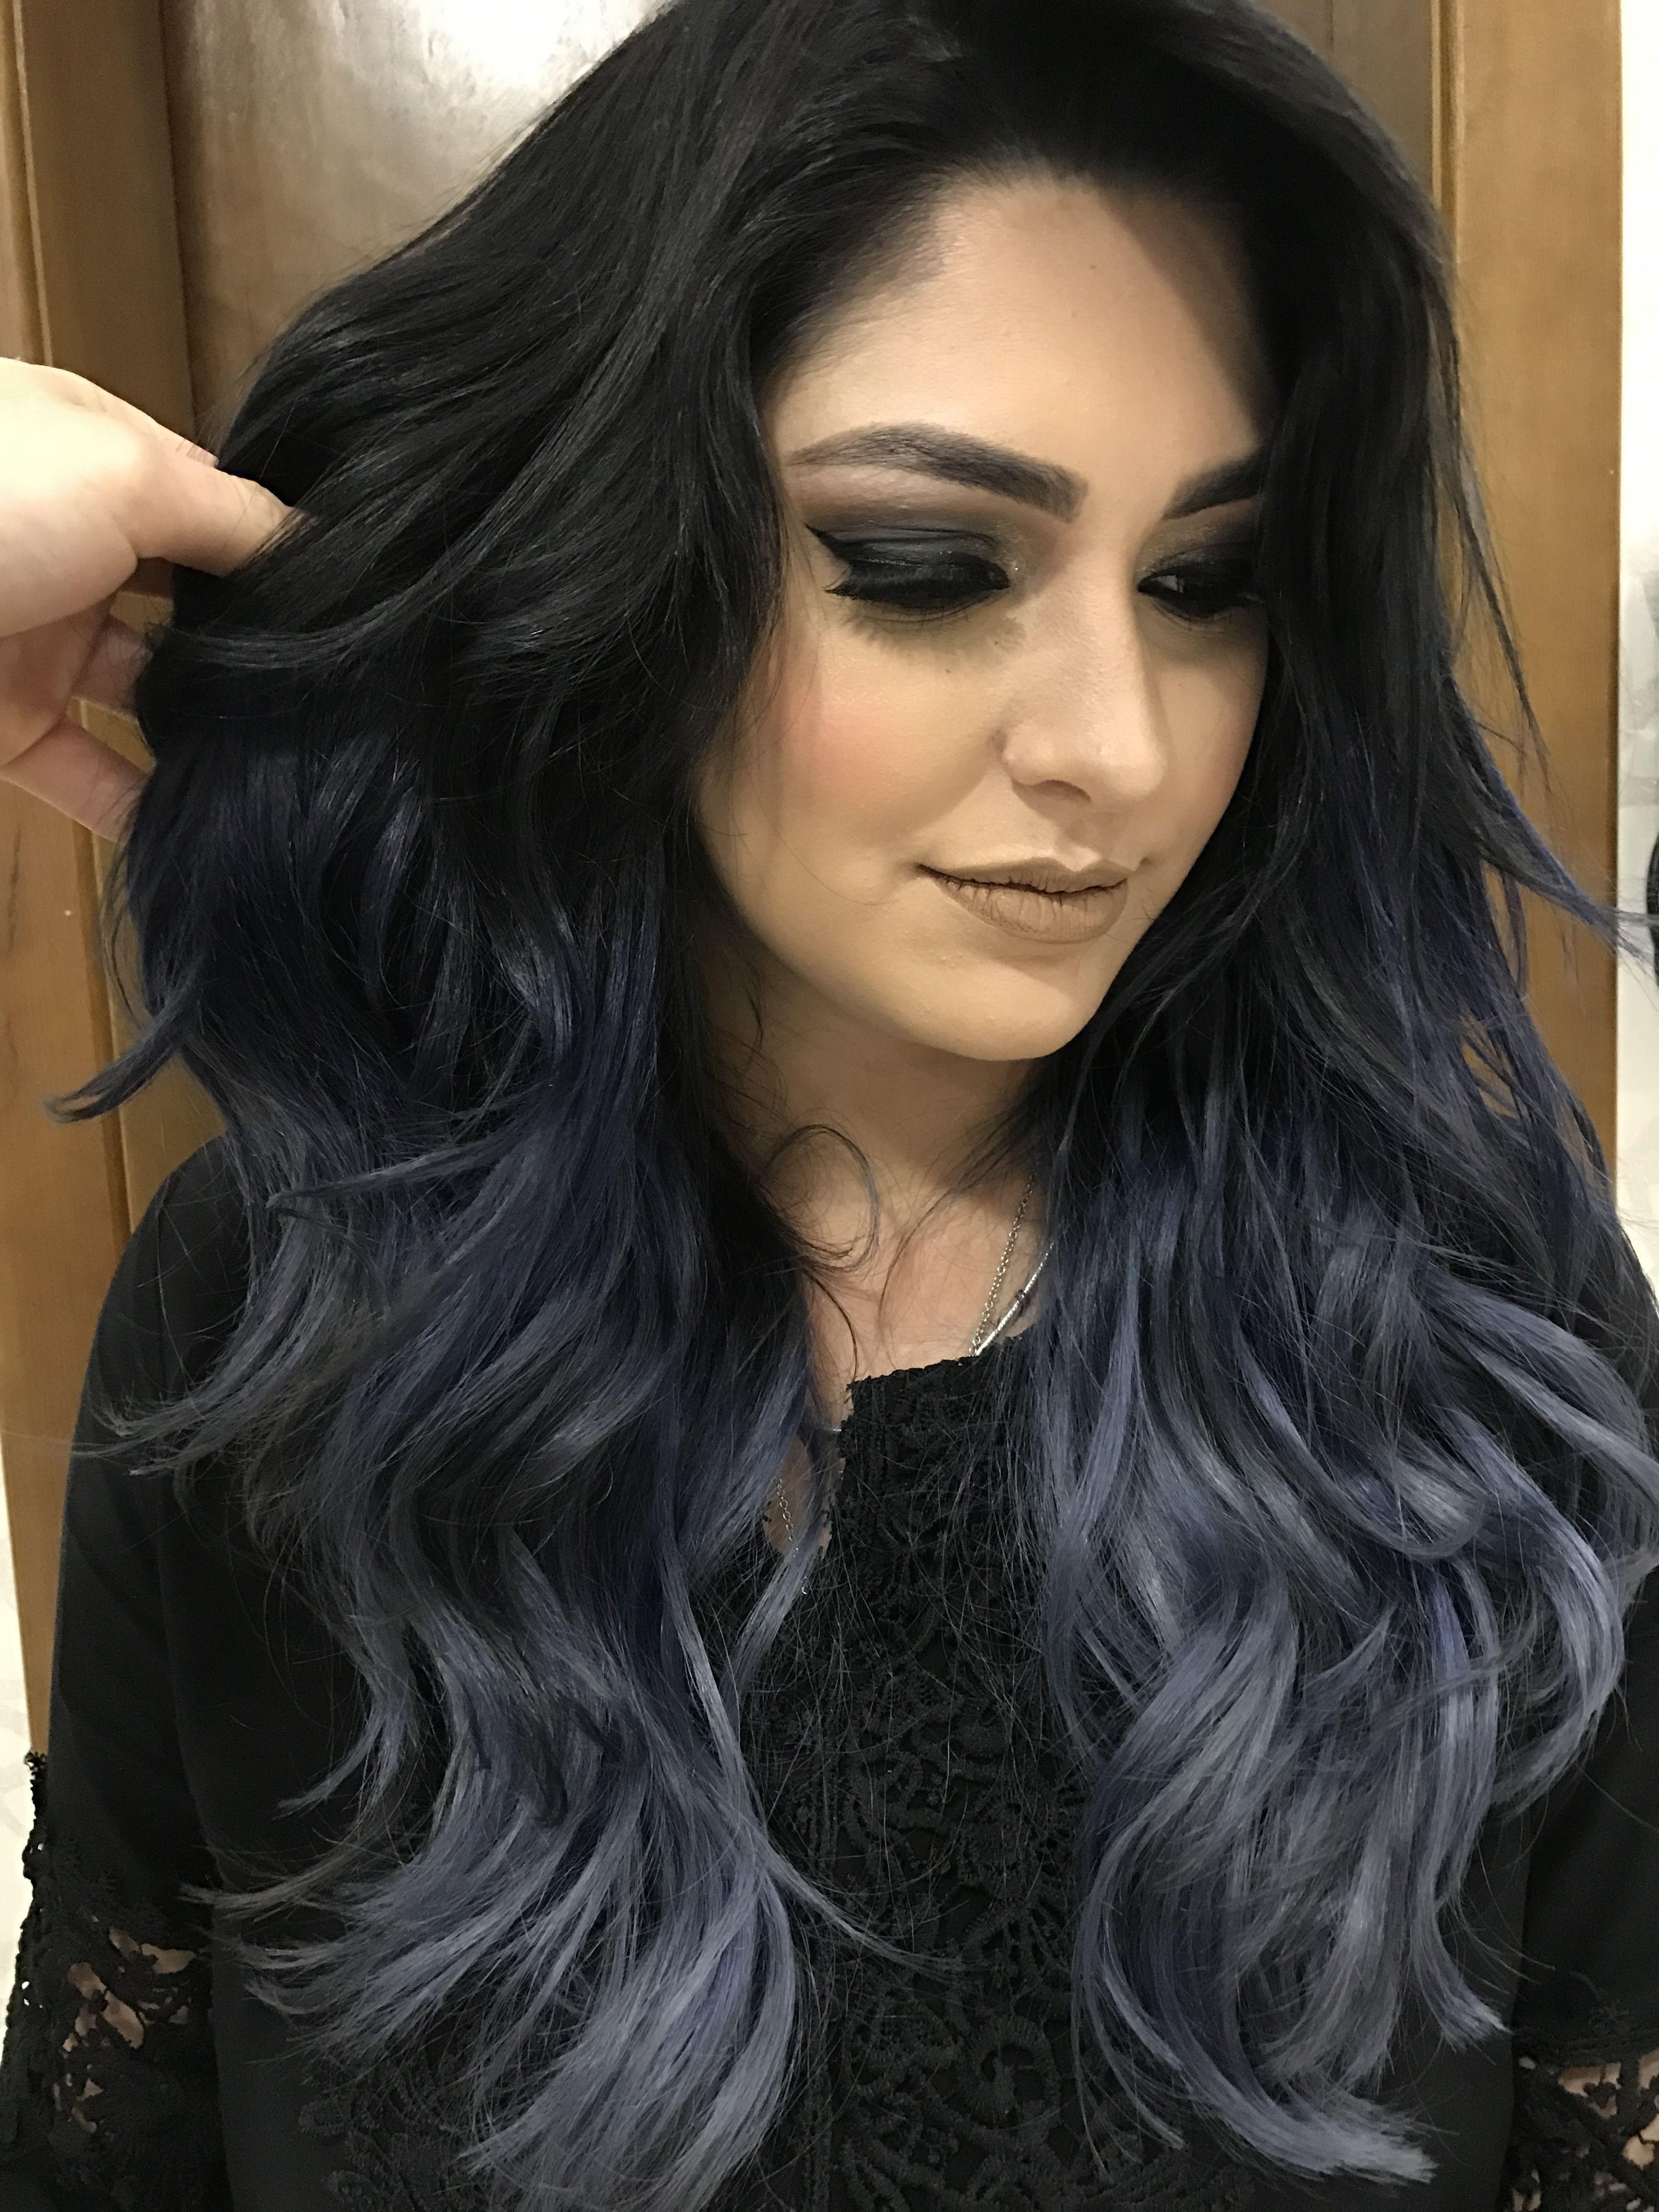 Charcoal Hair • Tendência para um visual estiloso. Aposte ...